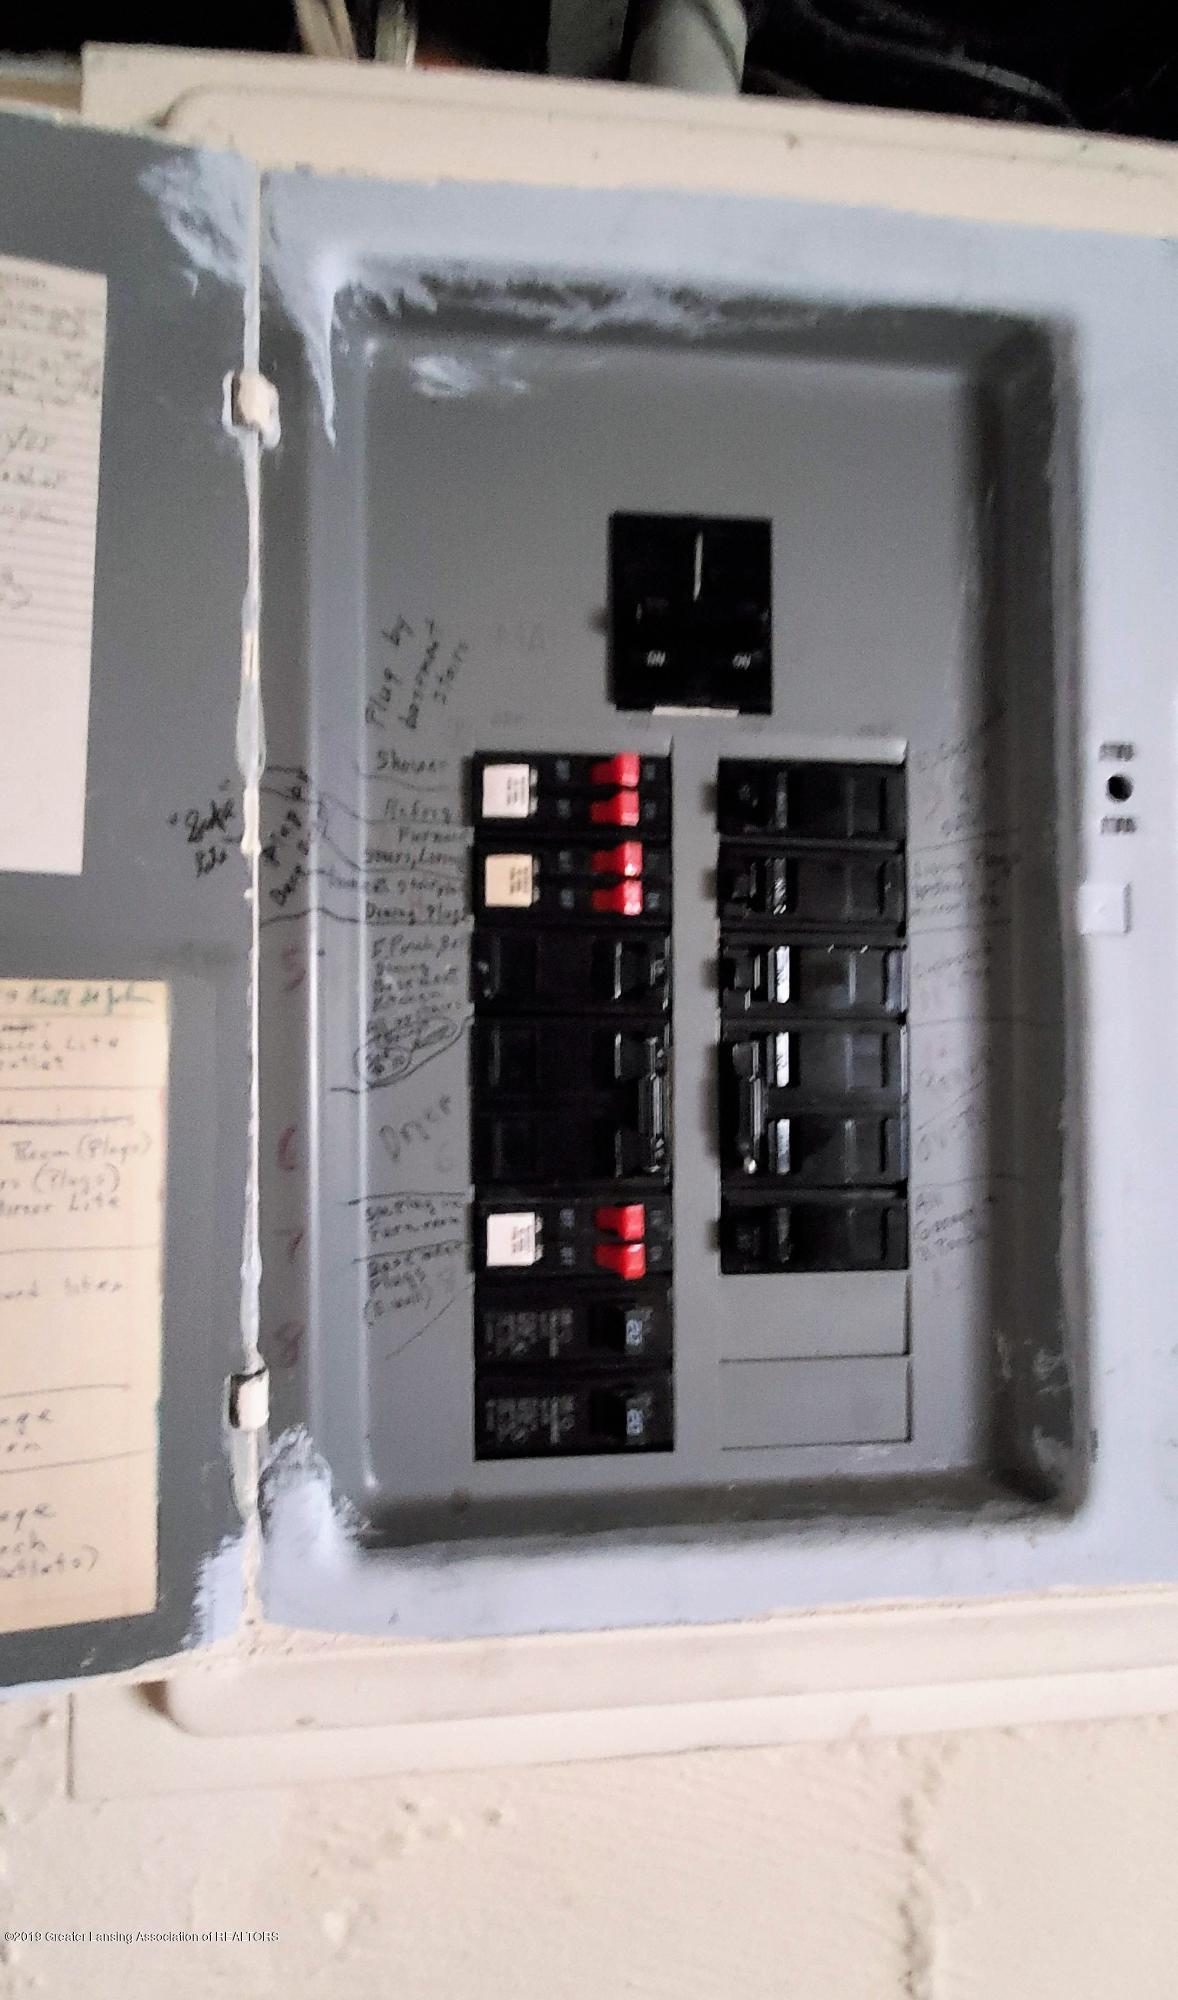 1325 Vine St - Mechanicals - Electric Panel - 18